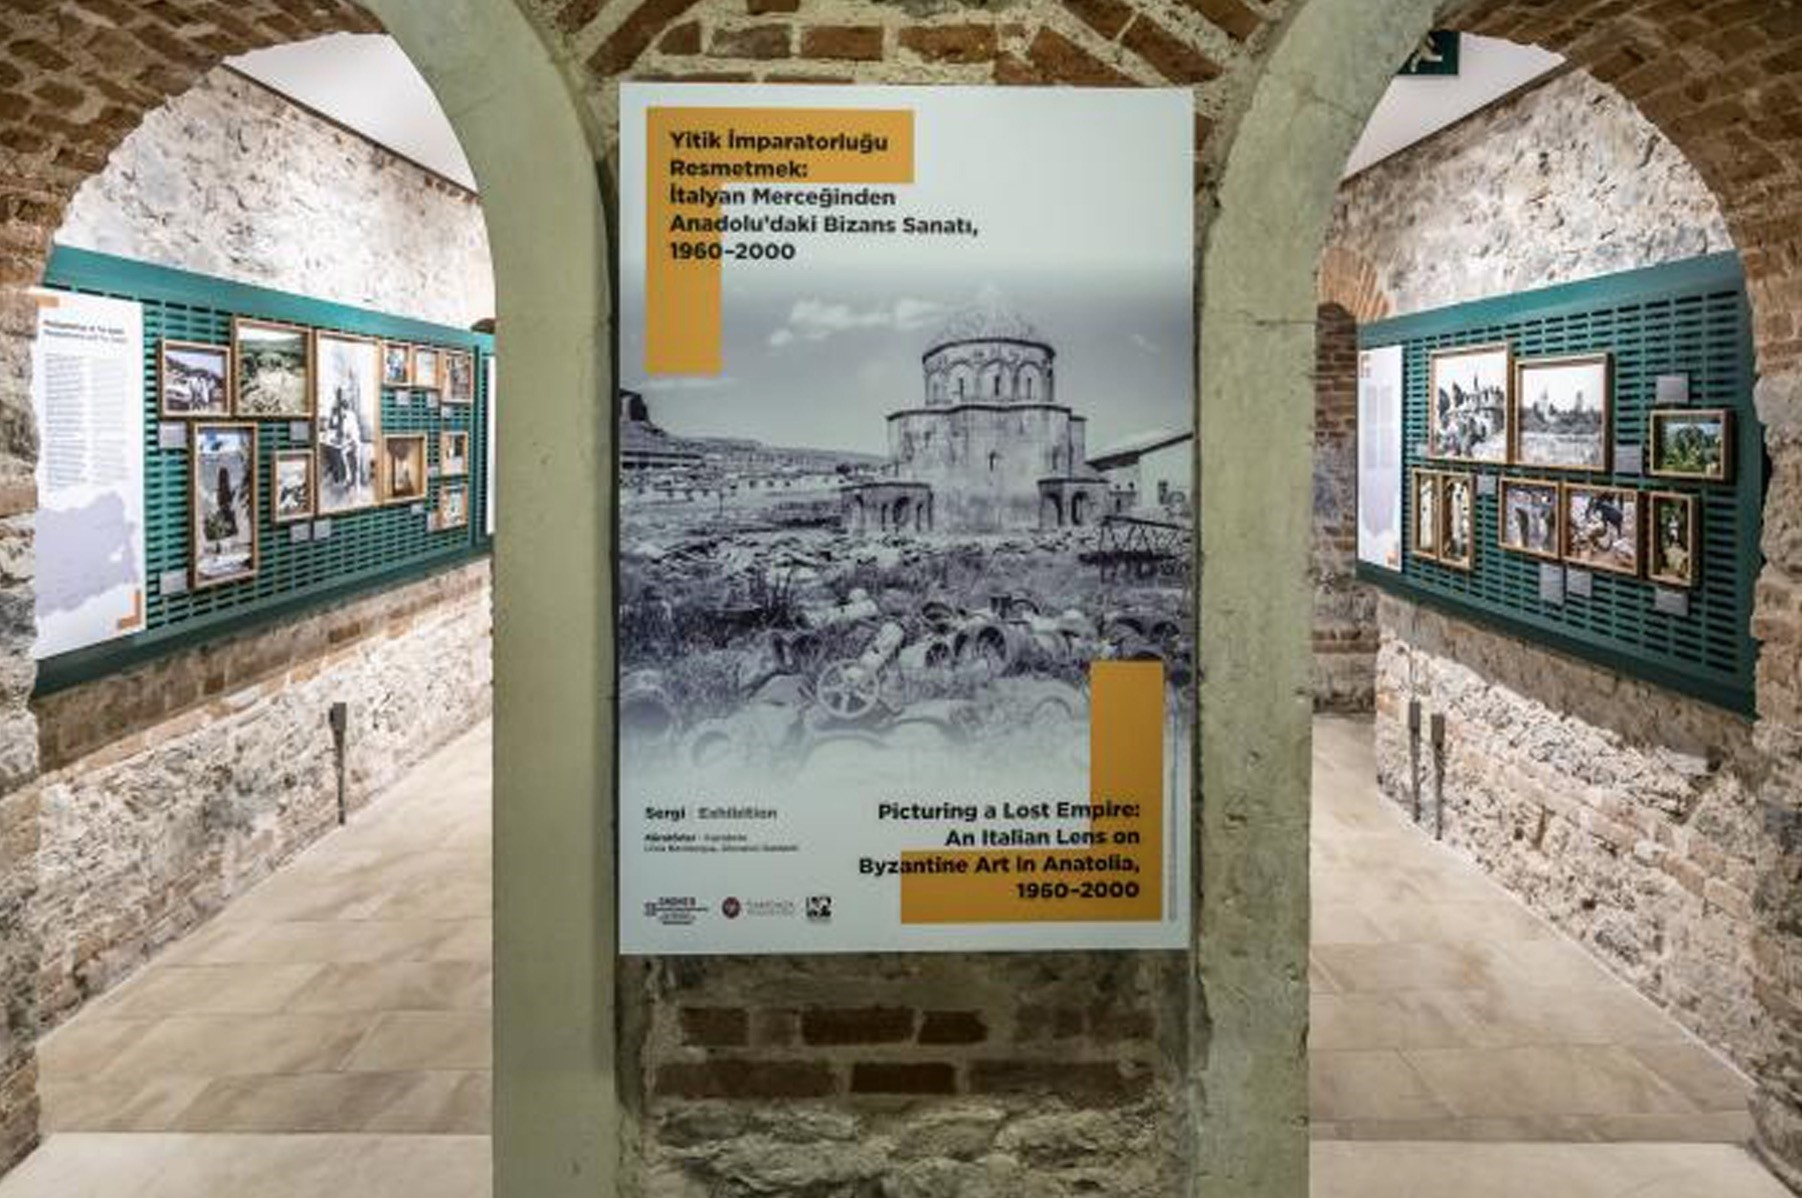 u201cPicturing a Lost Empire: An Italian Lens on Byzantine Art in Anatolia, 1960-2000.u201d